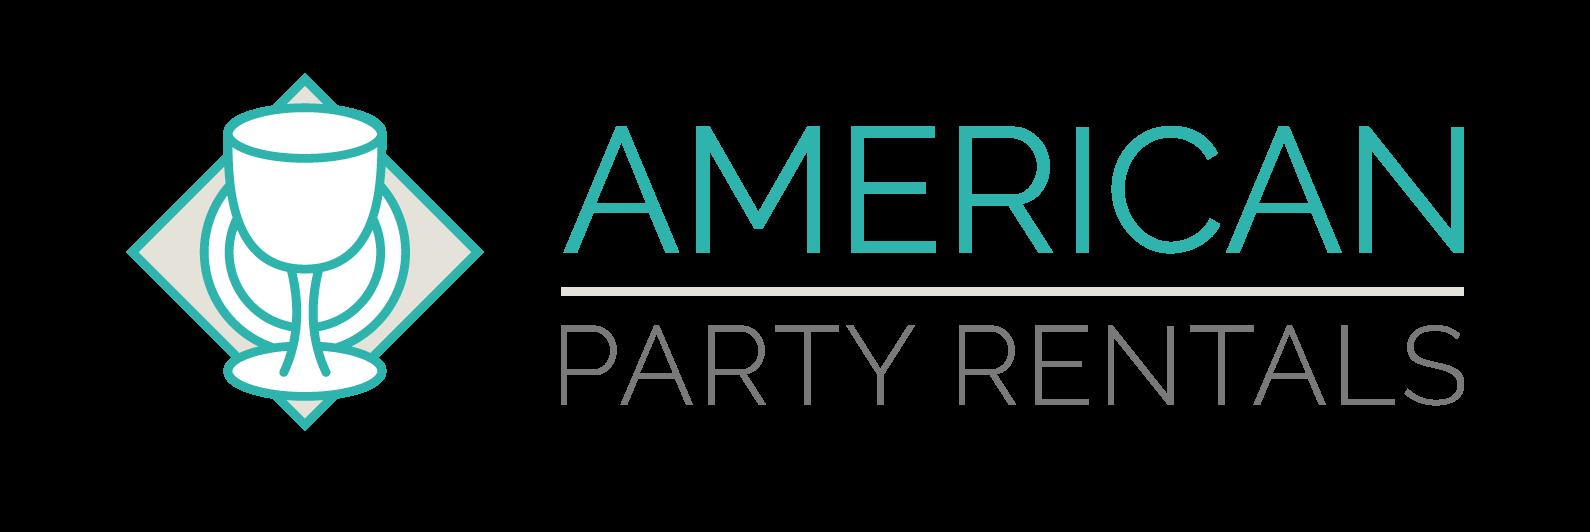 APR_logo_L.png